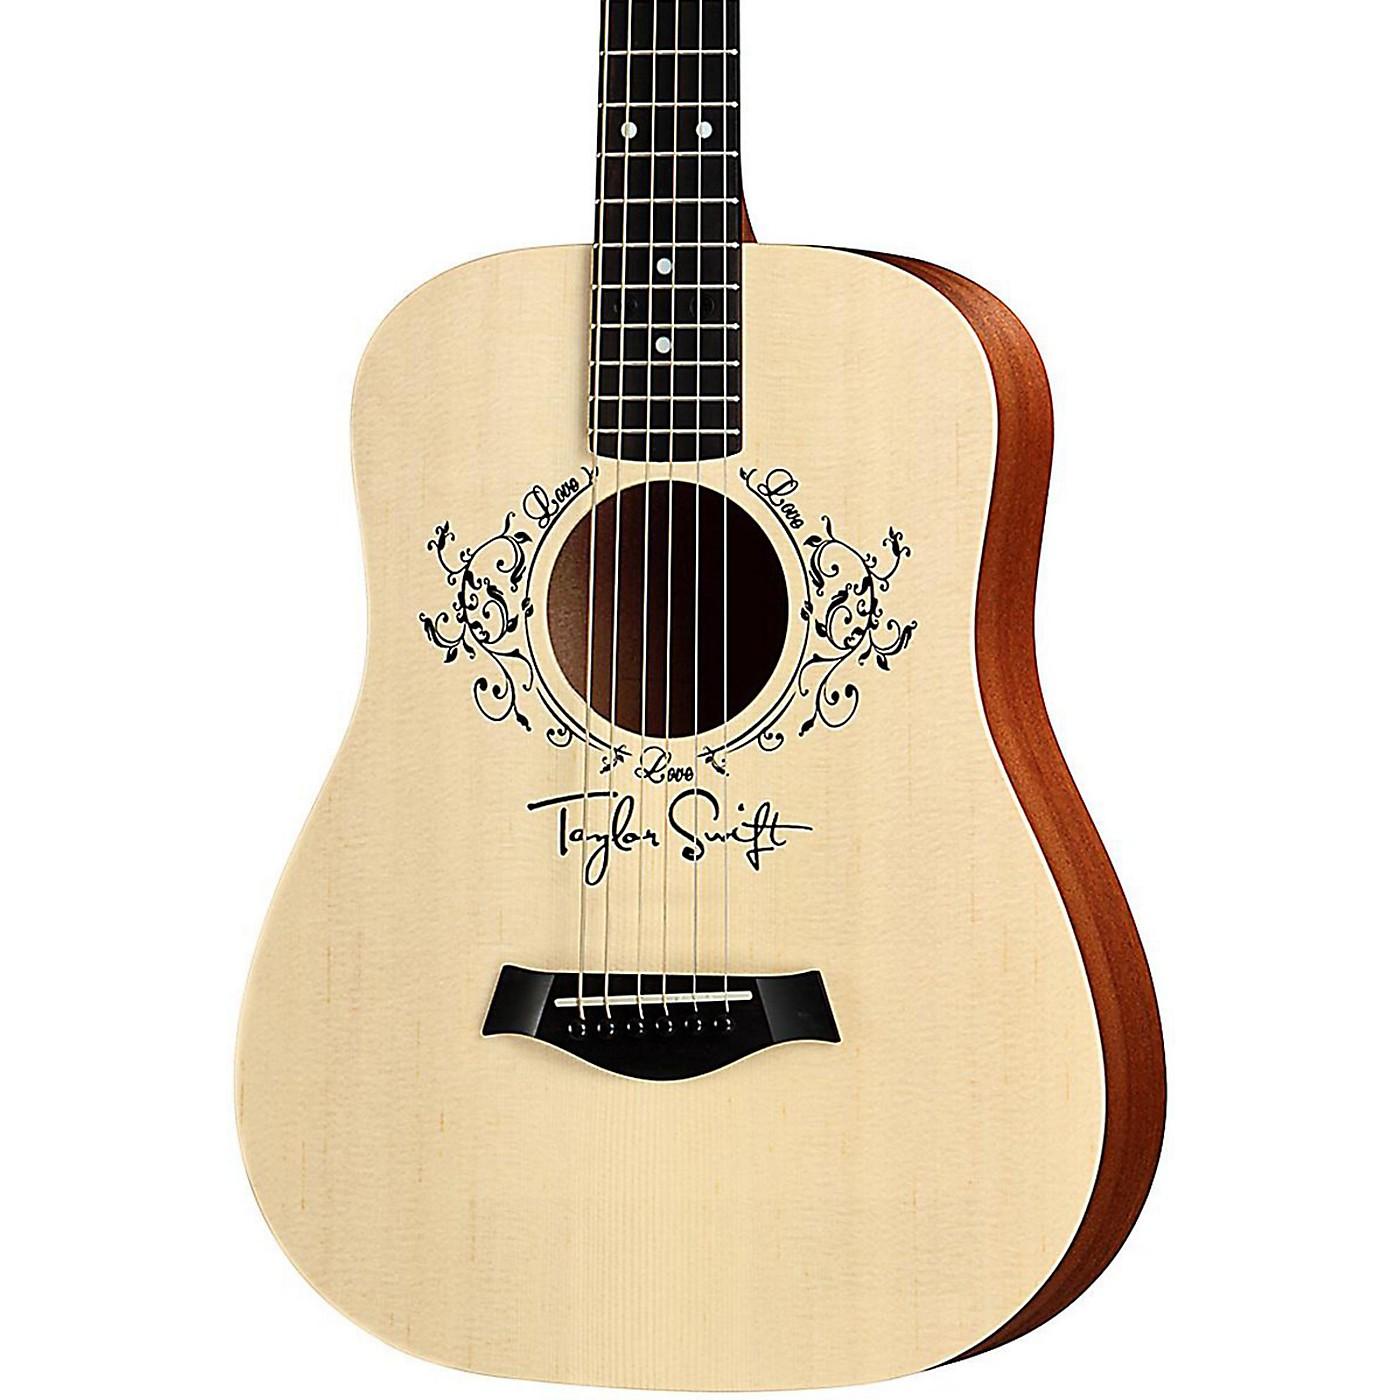 Taylor Taylor Swift Signature Baby Taylor Acoustic-Electric Guitar thumbnail